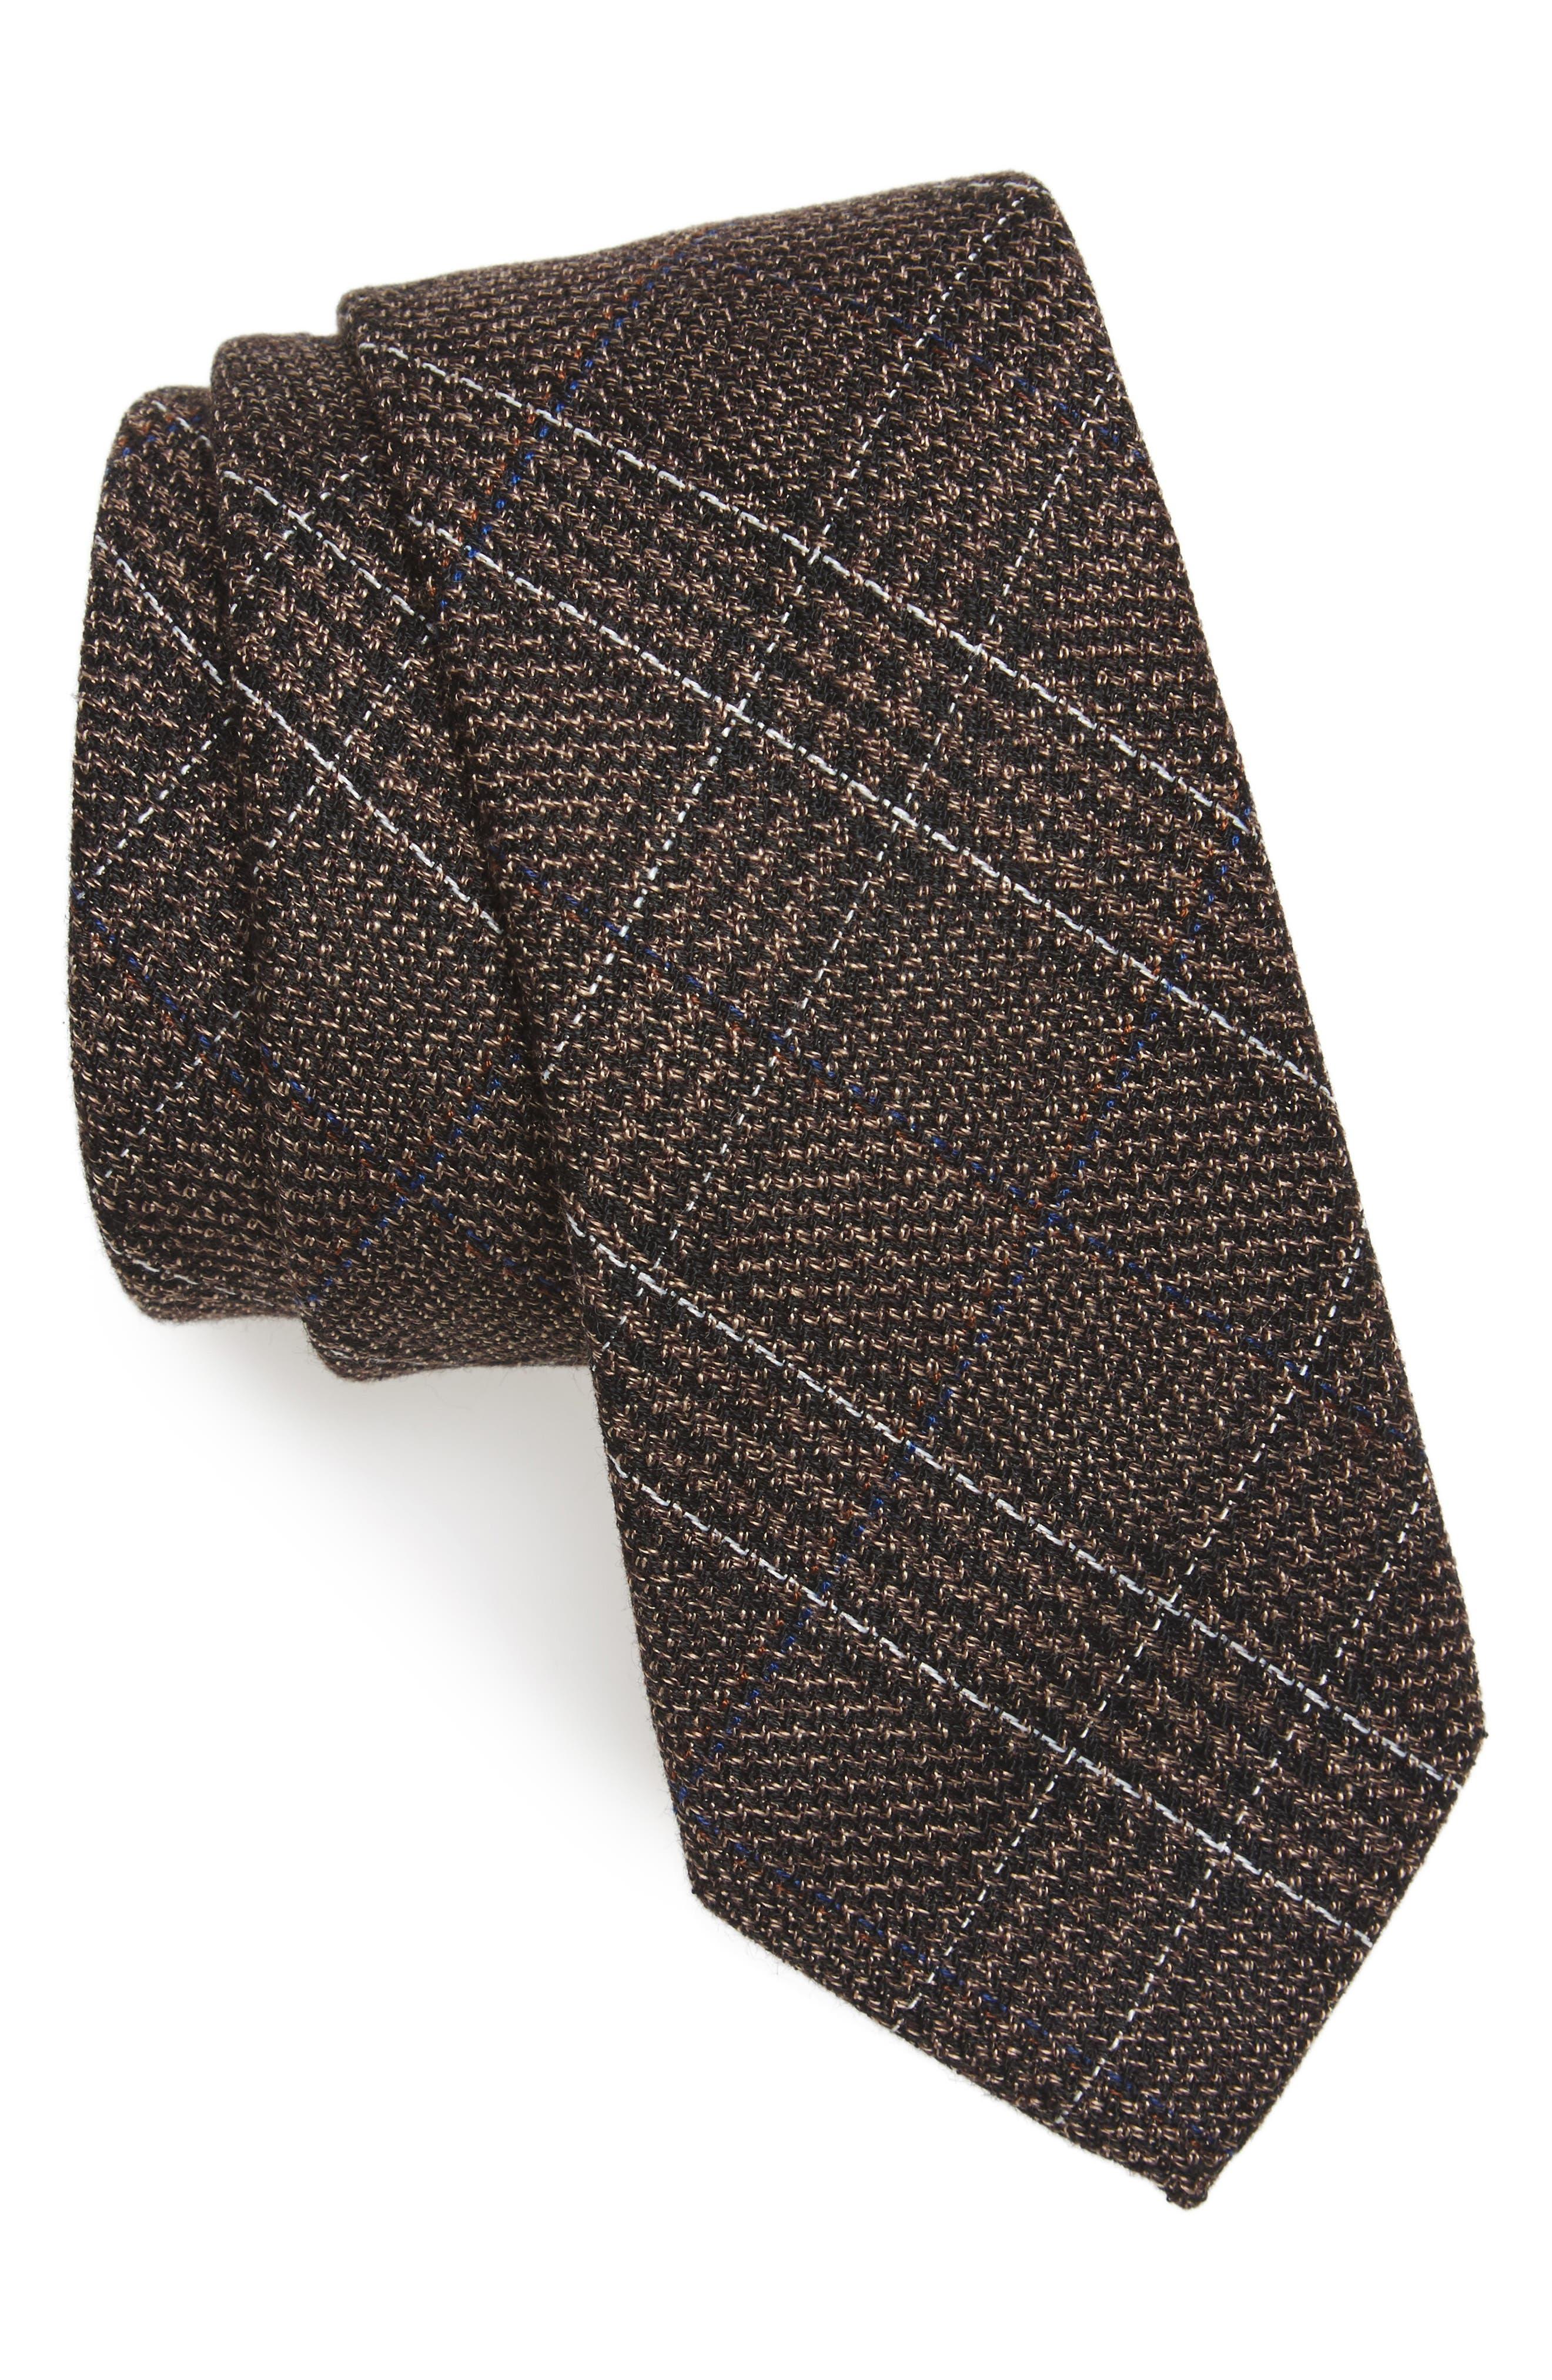 Alternate Image 1 Selected - Nordstrom Men's Shop Eastview Check Skinny Tie